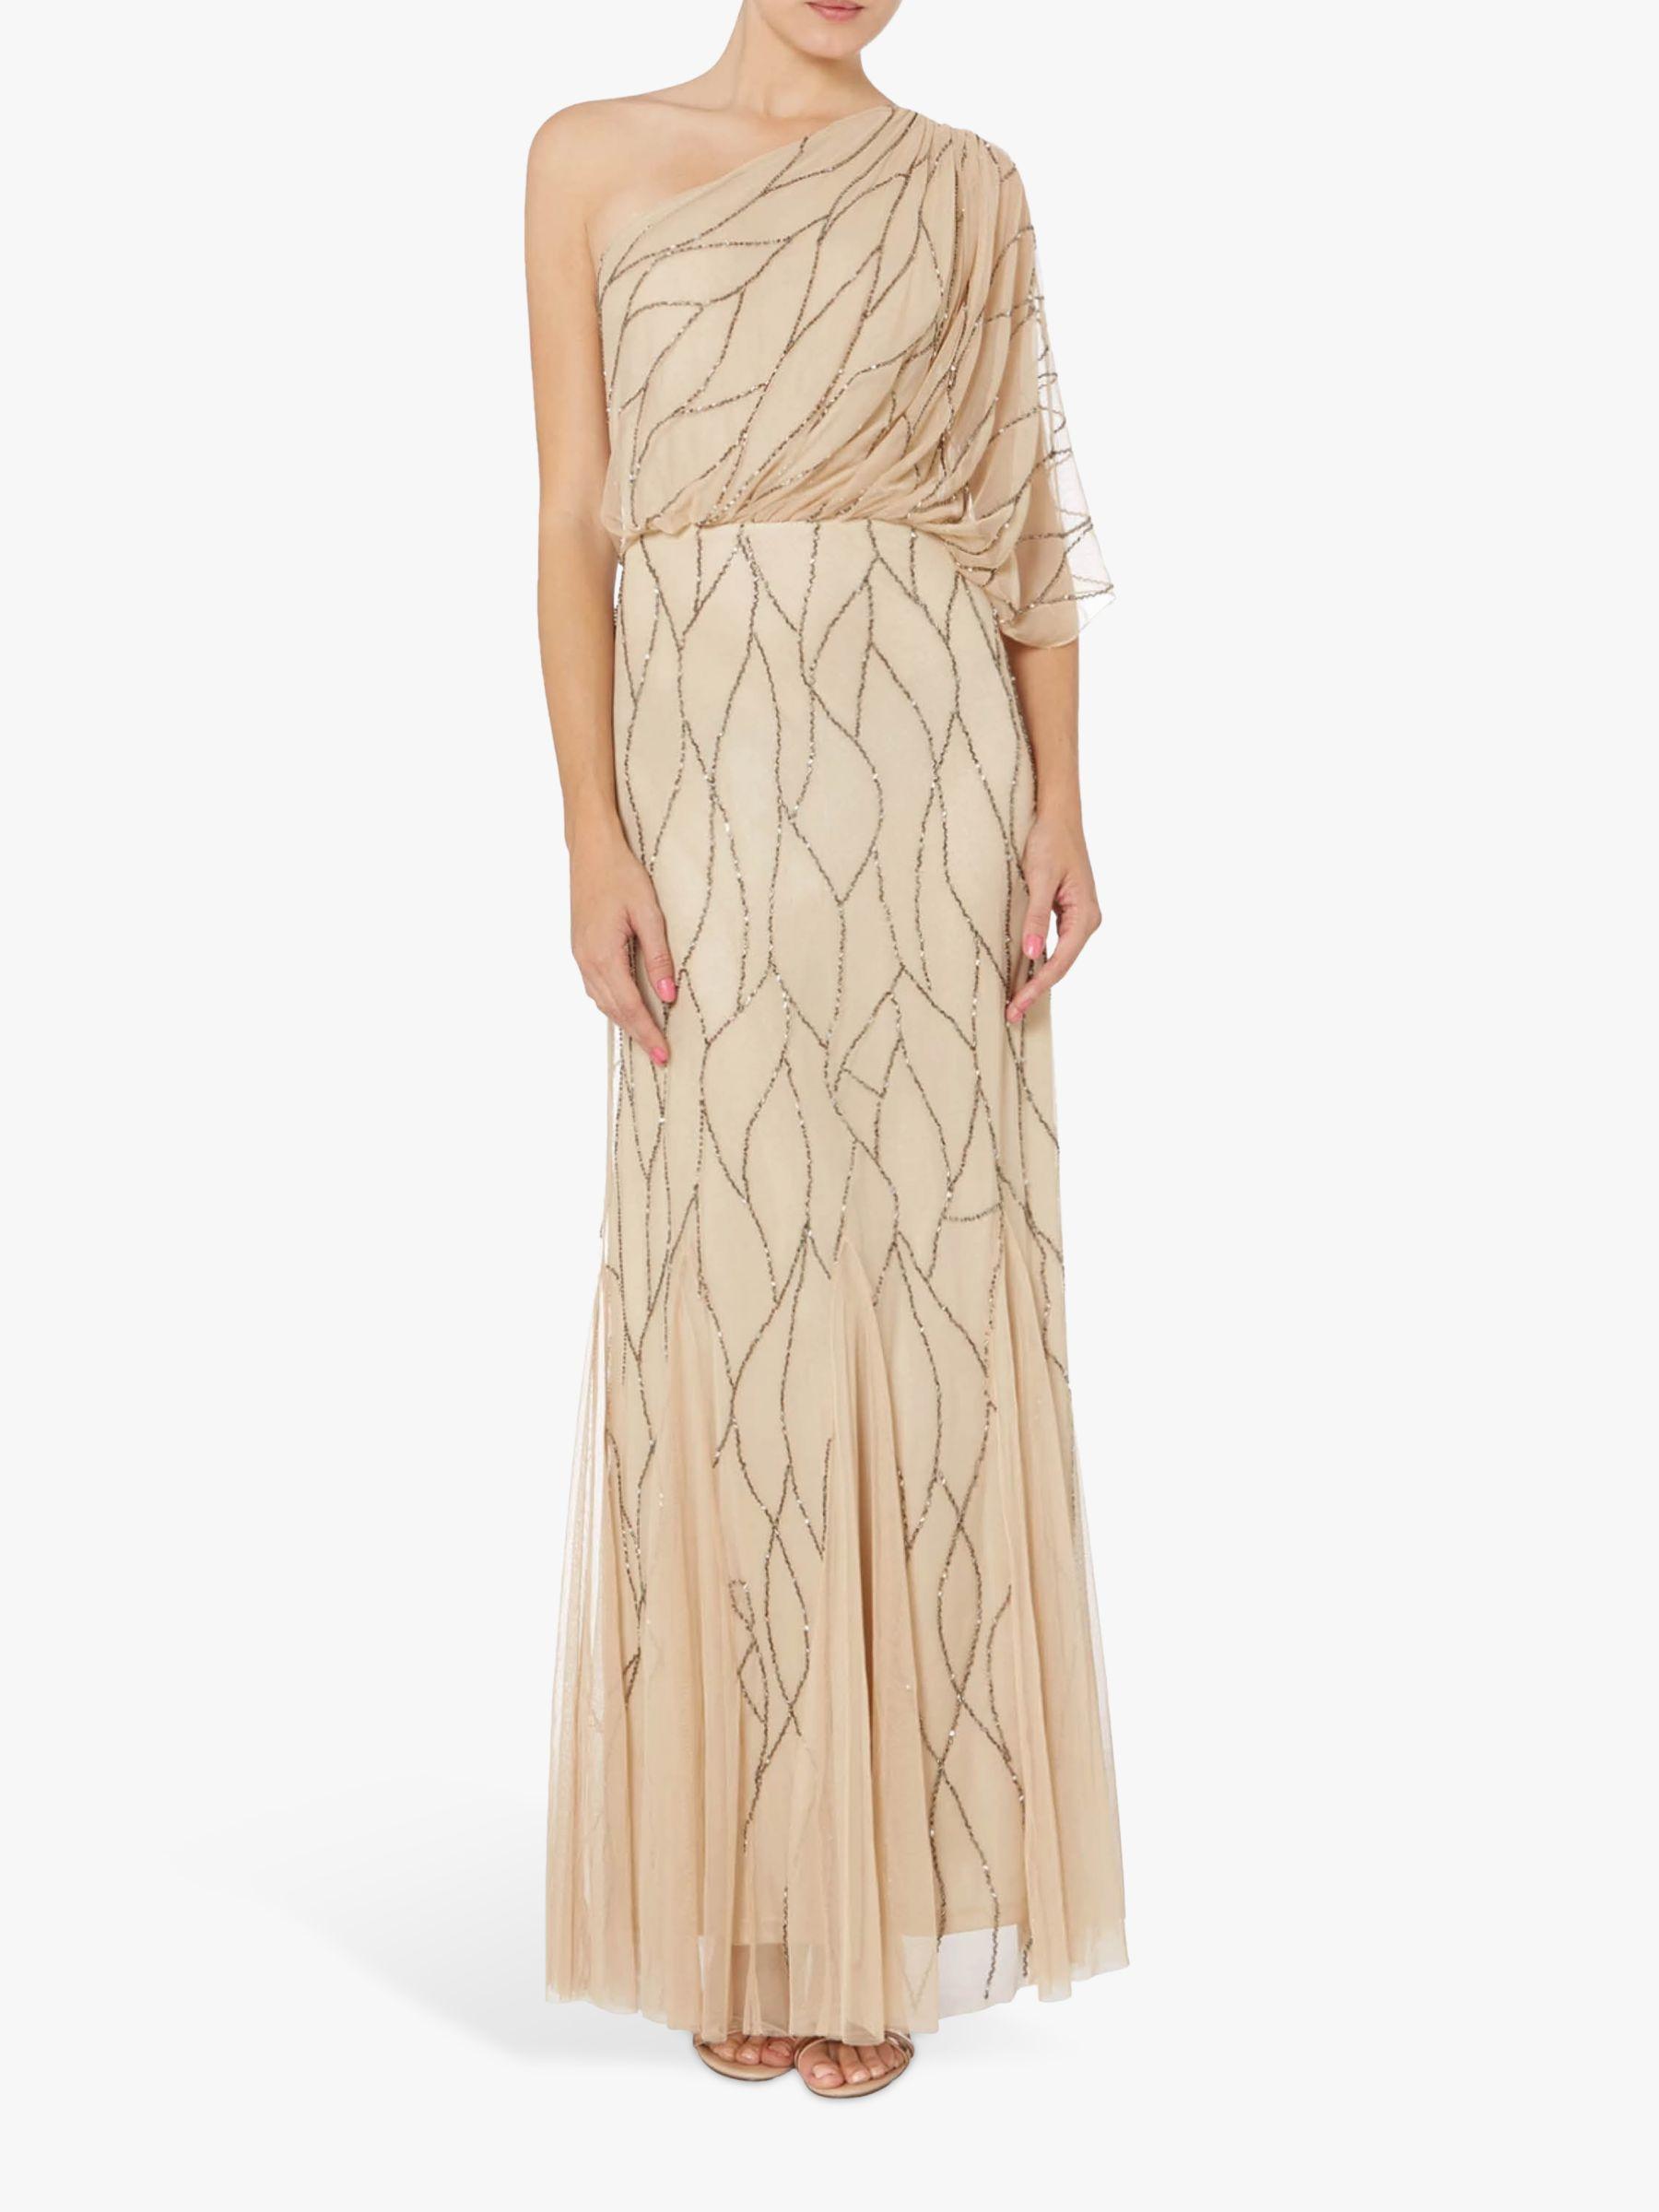 RAISHMA Raishma Embellished One Shoulder Dress, Champagne